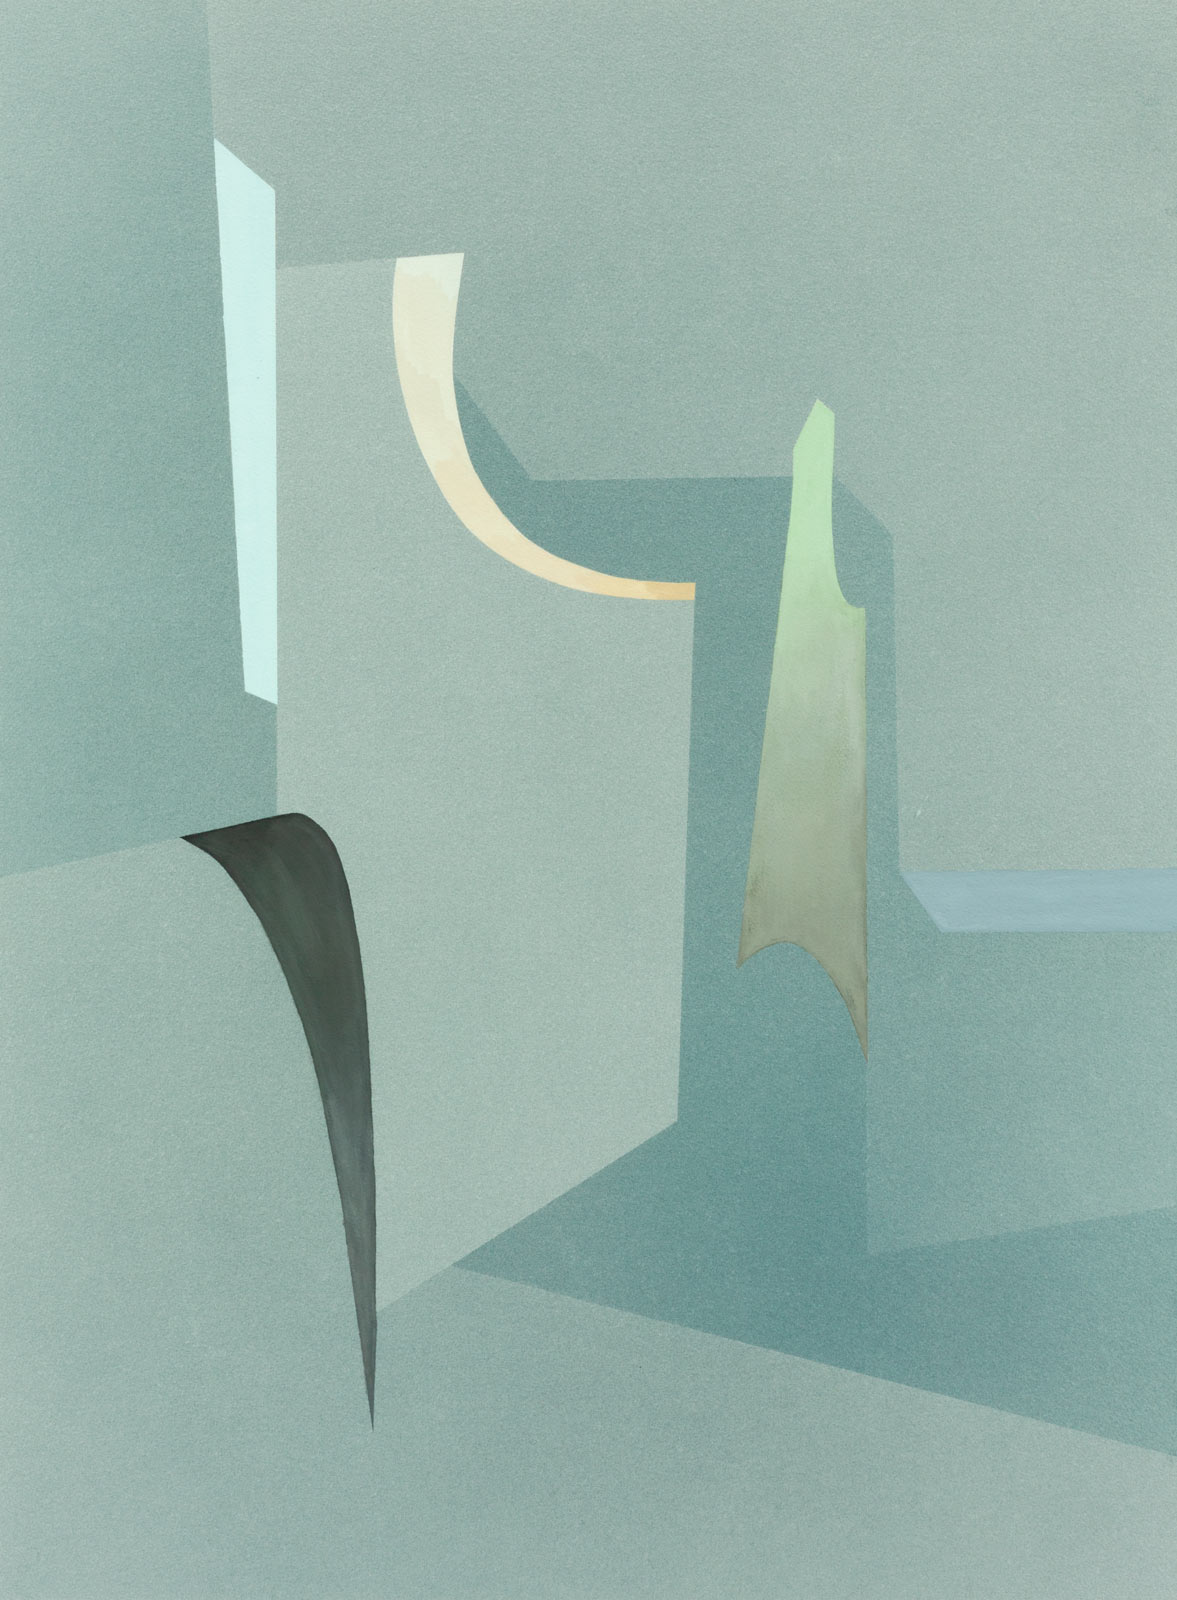 Lightcurves lI, 2019. Watercolour and casein on paper, 93 x 68,5 cm